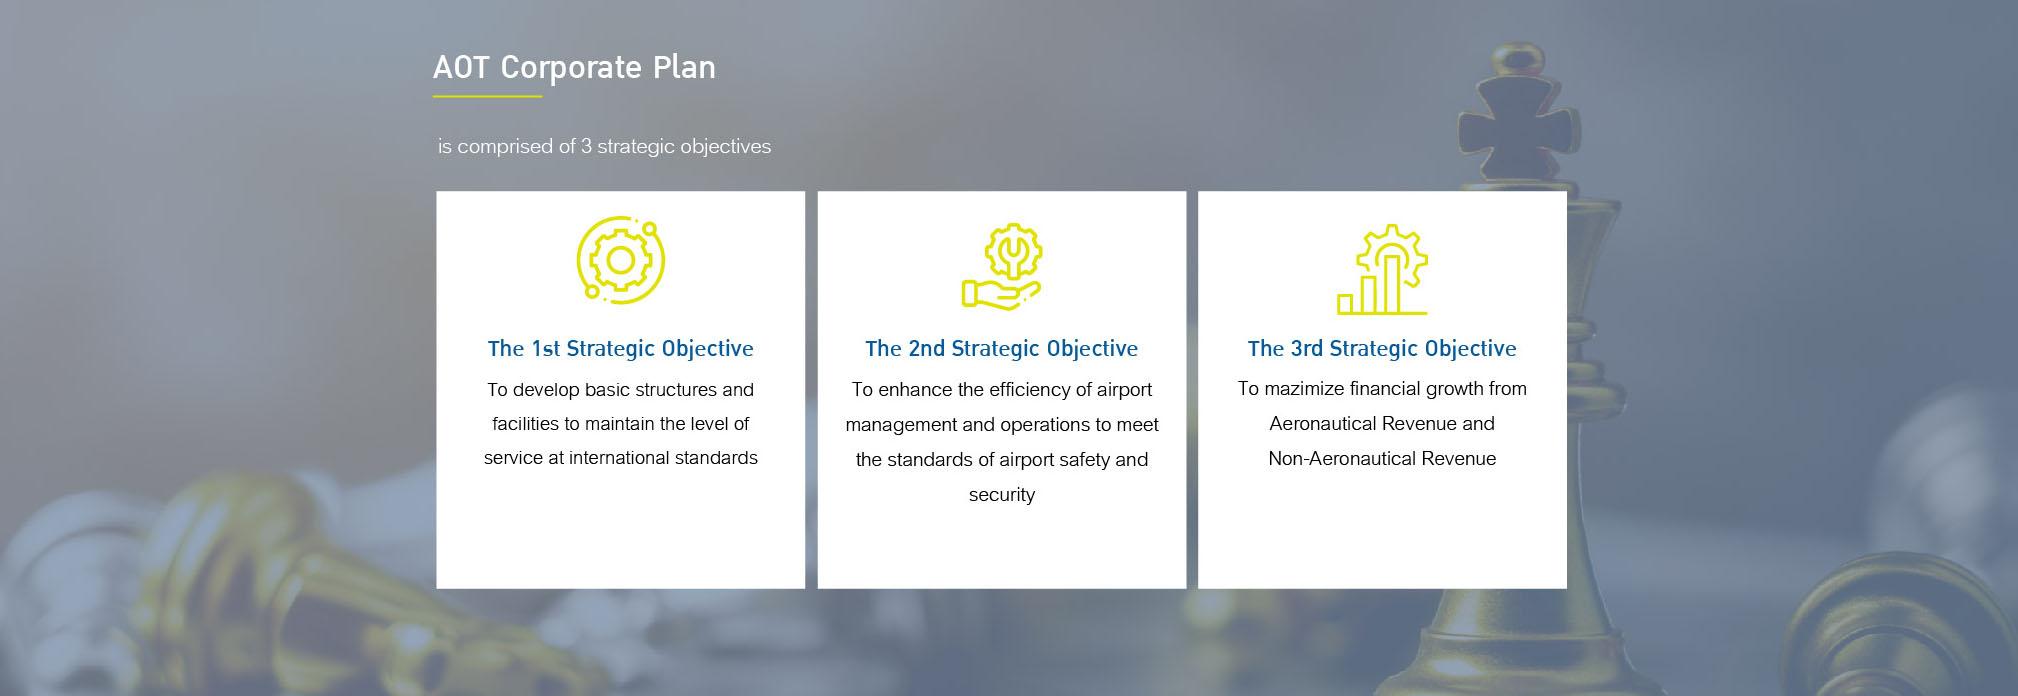 AOT Corporate Plan